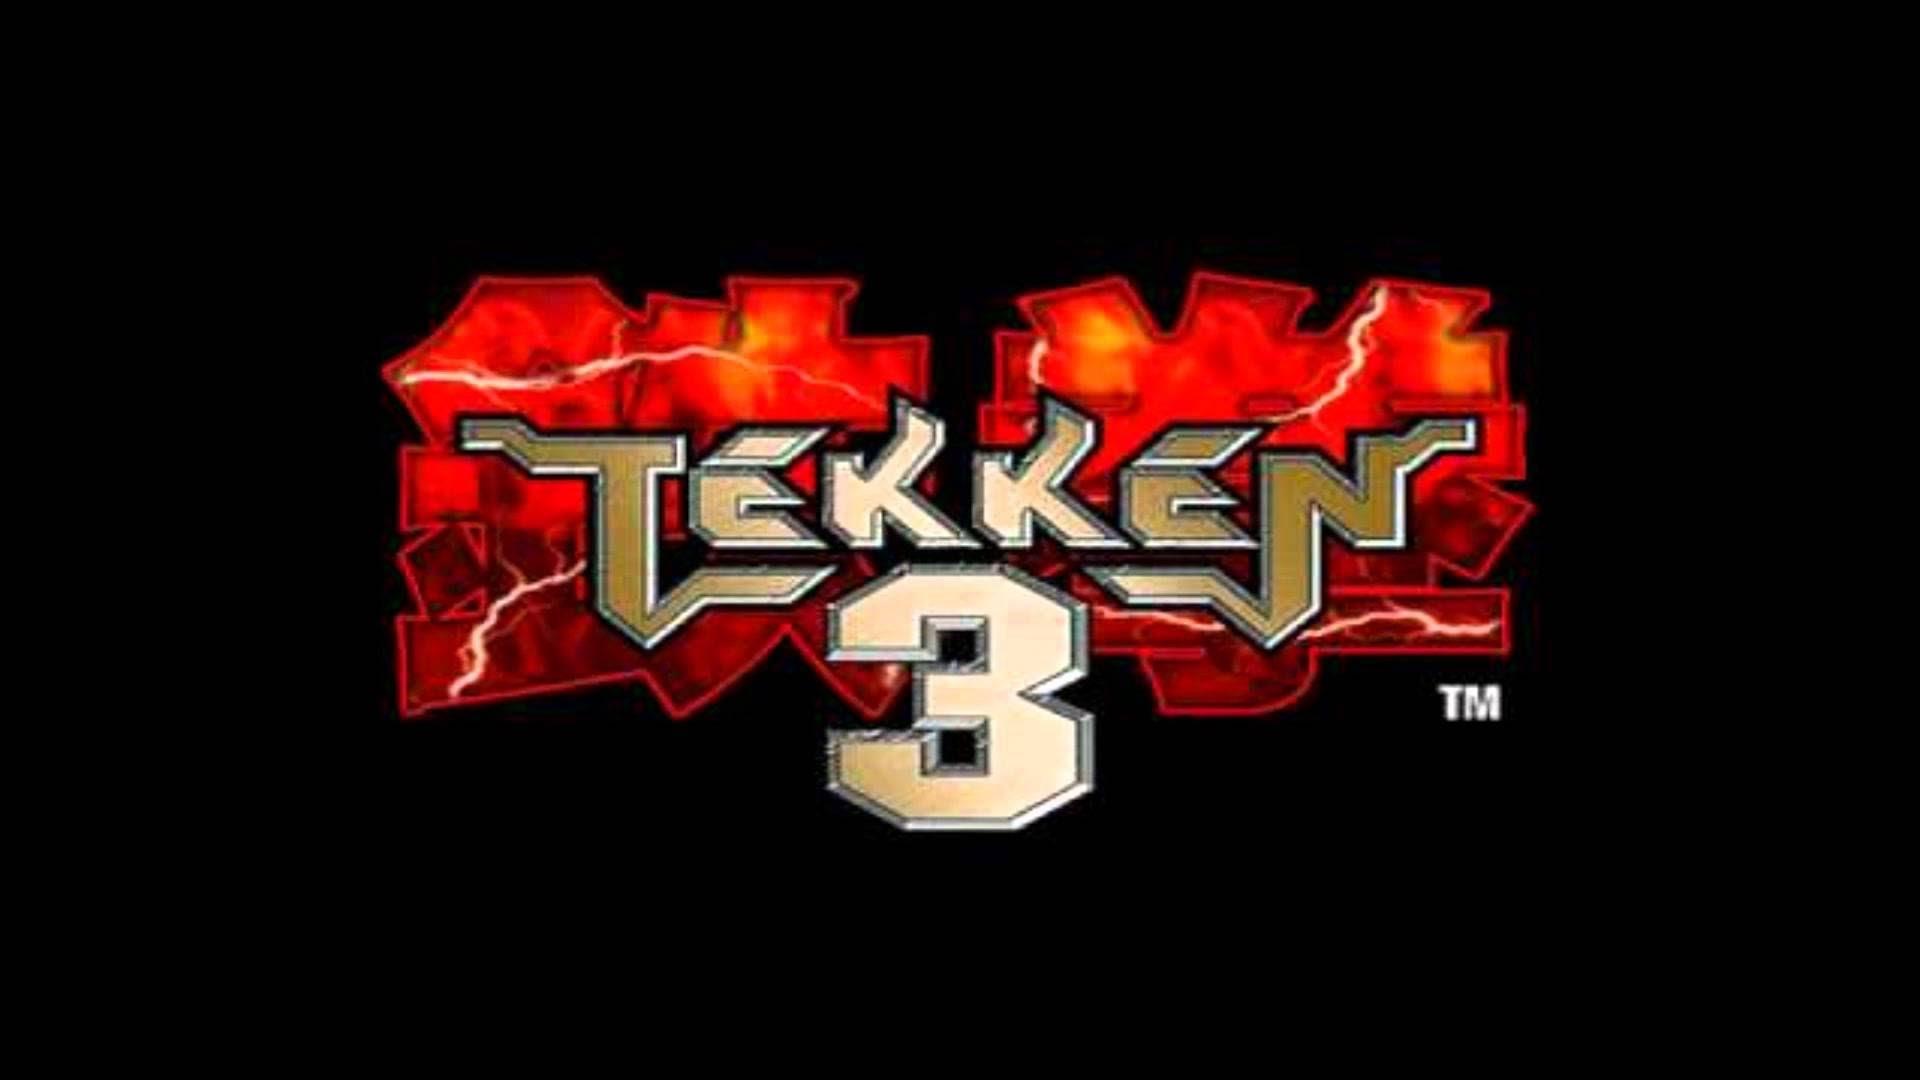 tekken 3 wallpaper - sf wallpaper